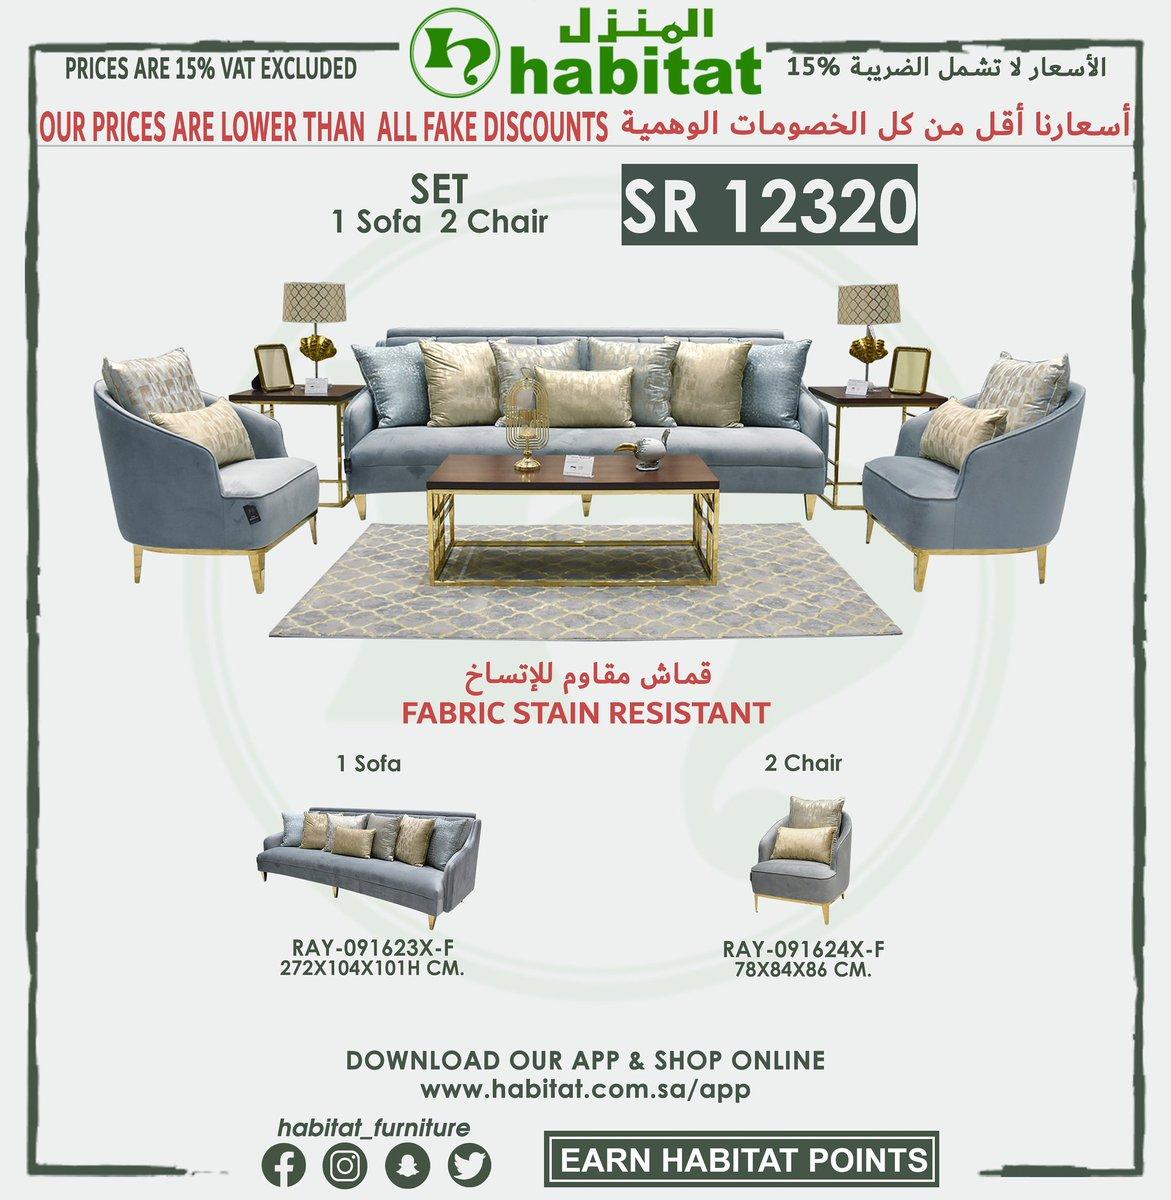 Habitatfurniture مفروشات المنزل Showroomhq Twitter